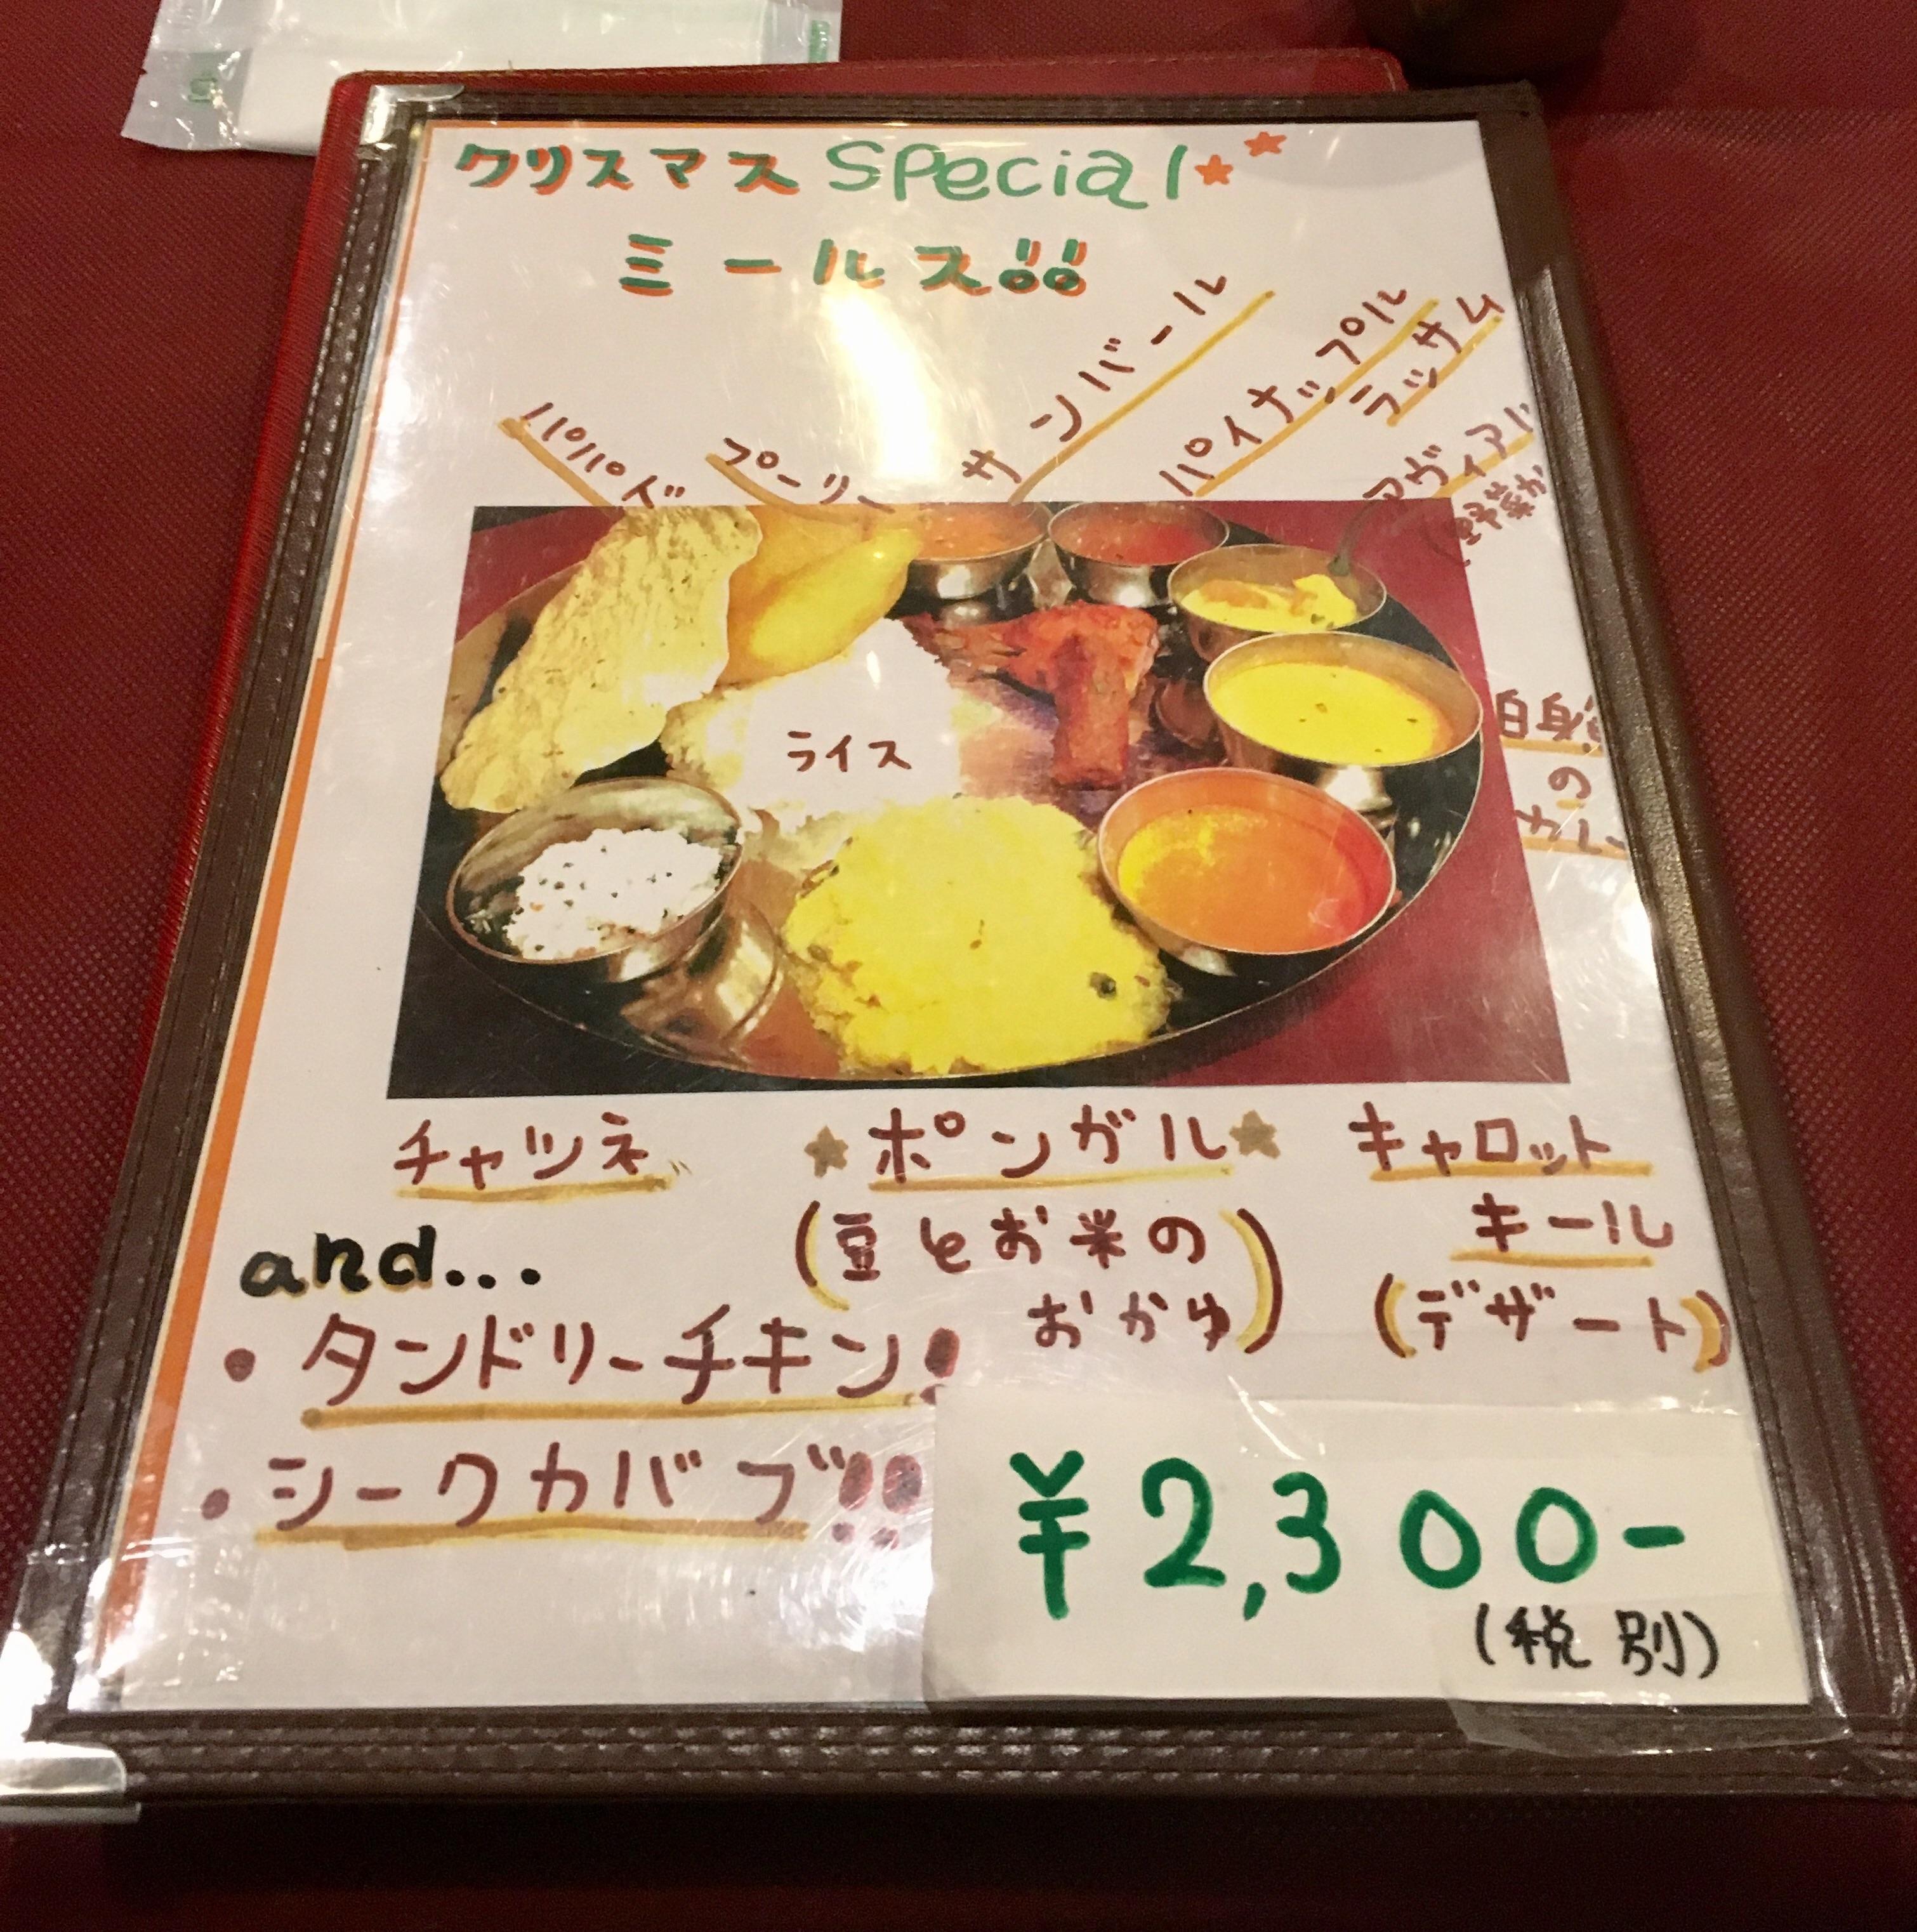 f:id:SoichiroIkeshita:20170104040358j:image